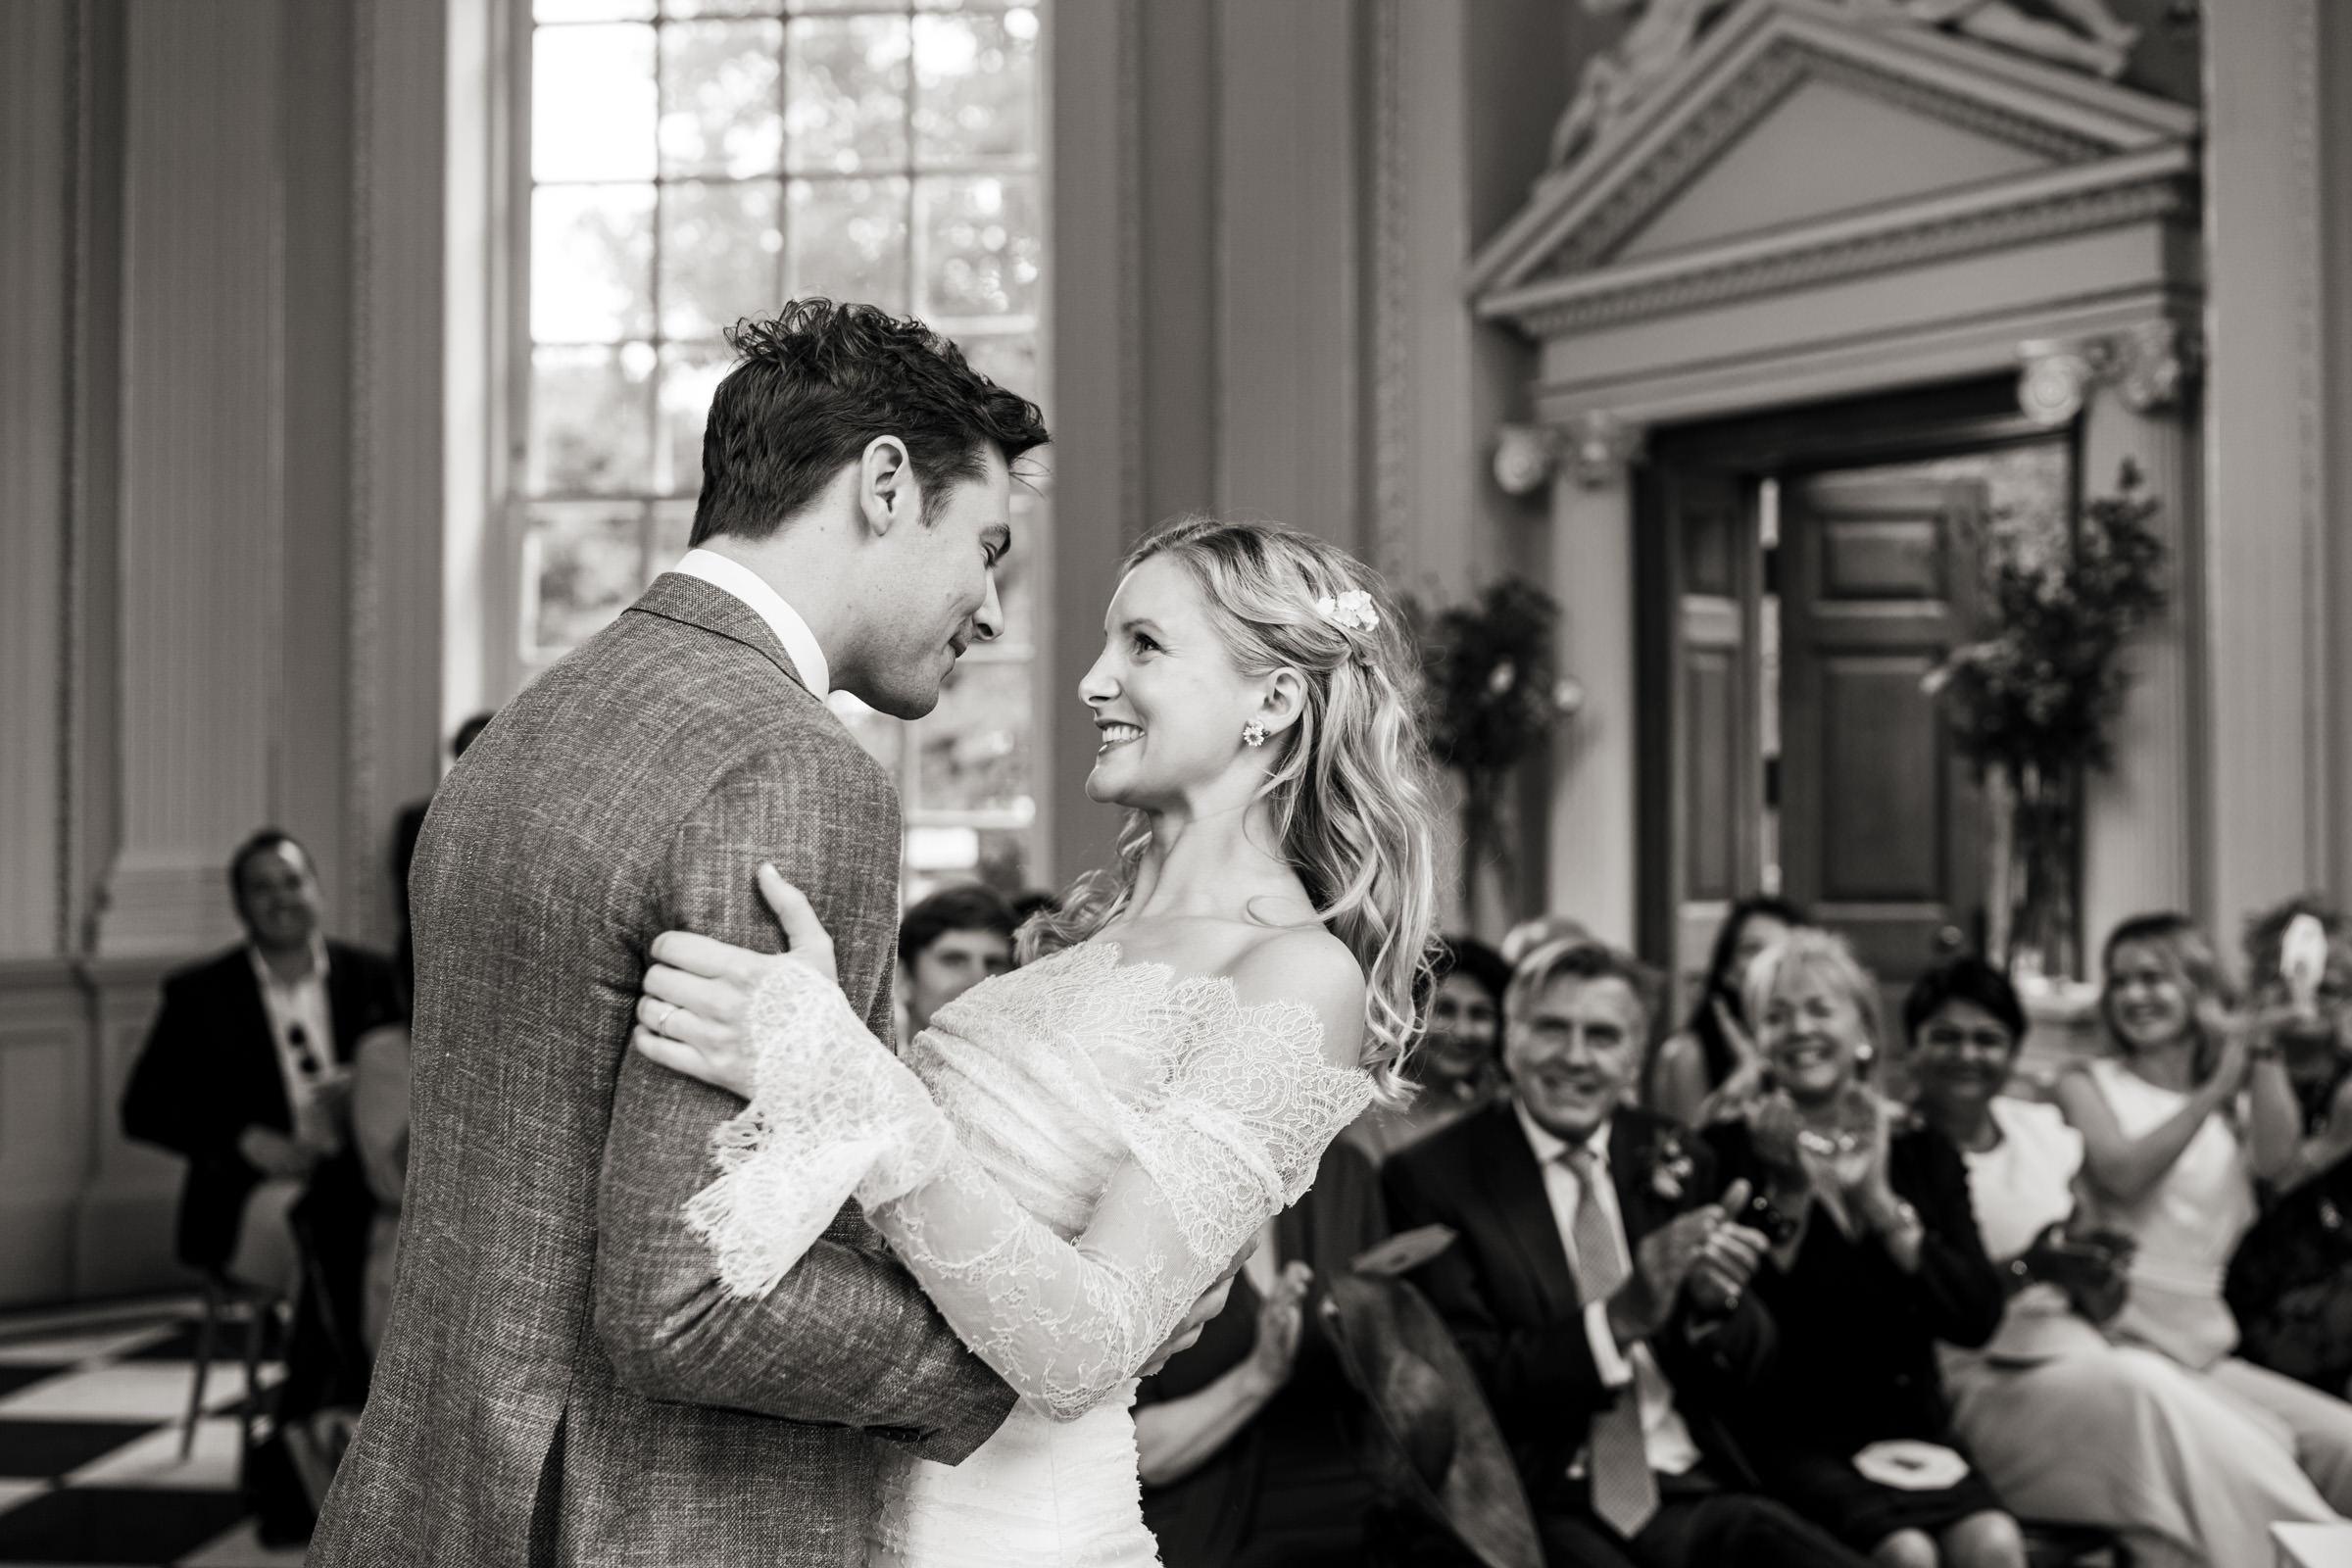 barbican london wedding photography 001.jpg